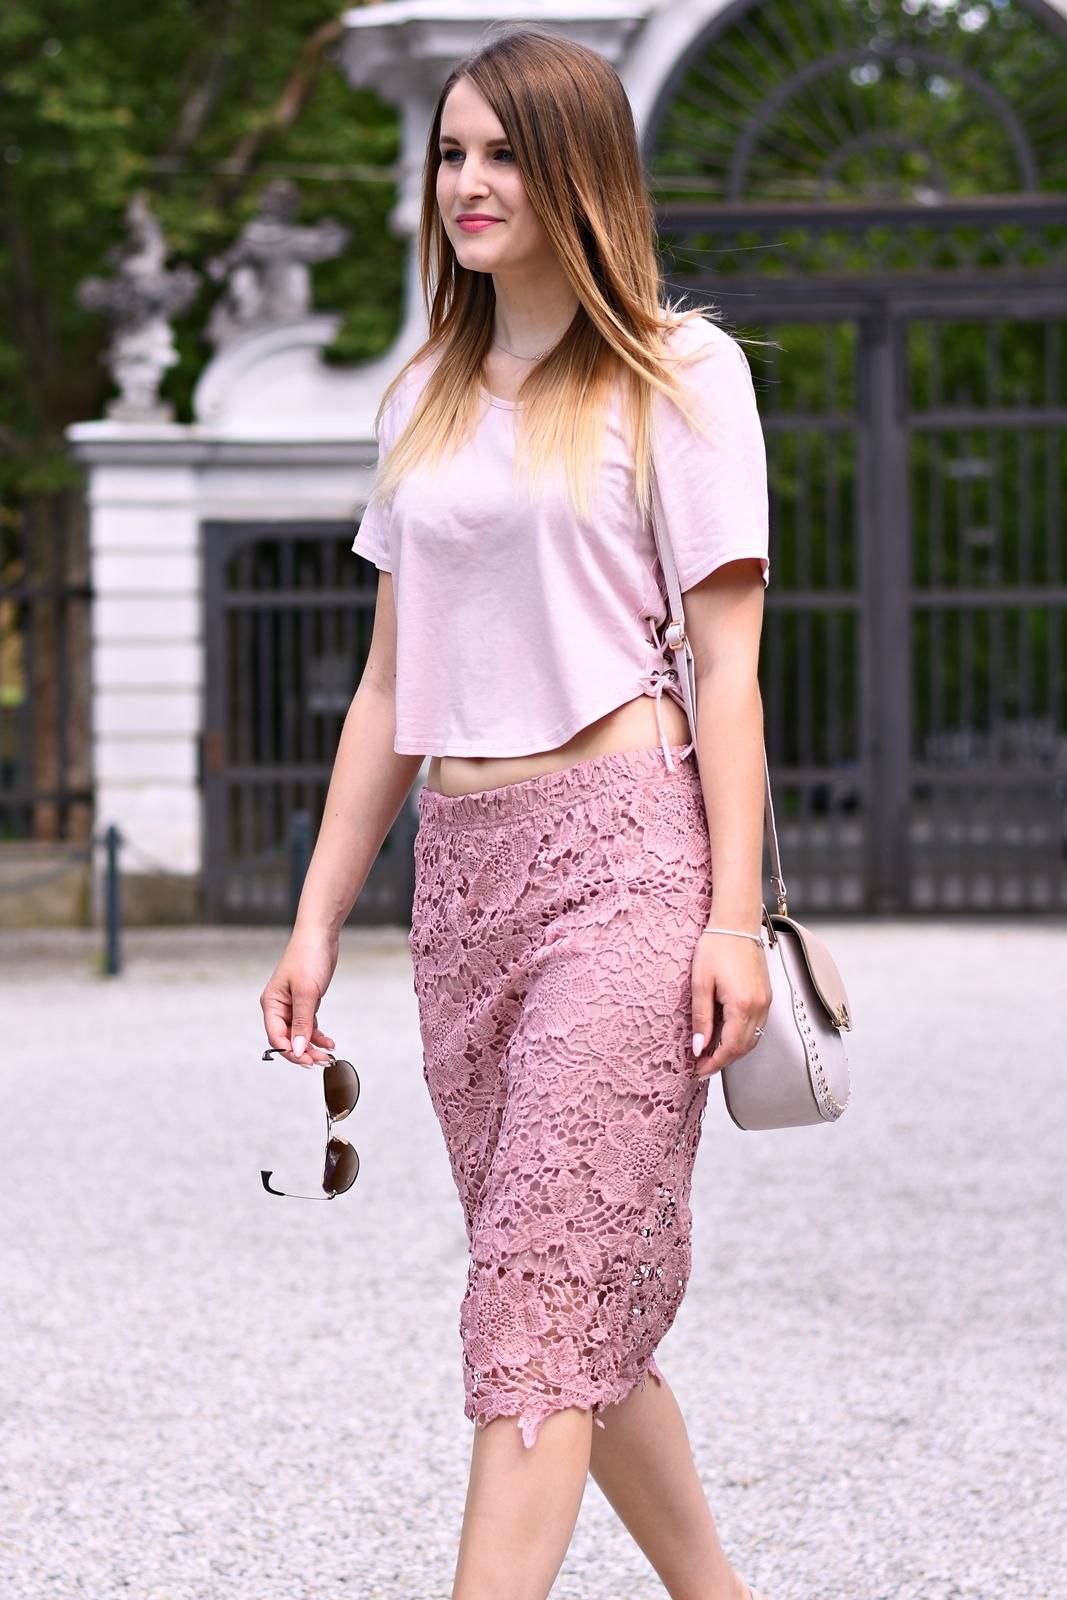 Ton in Ton Outfit - 4Styles 4u Blogparade - Fashion Mode Styling - Fashionladyloves by Tamara Wagner - Fashionblog Modeblog